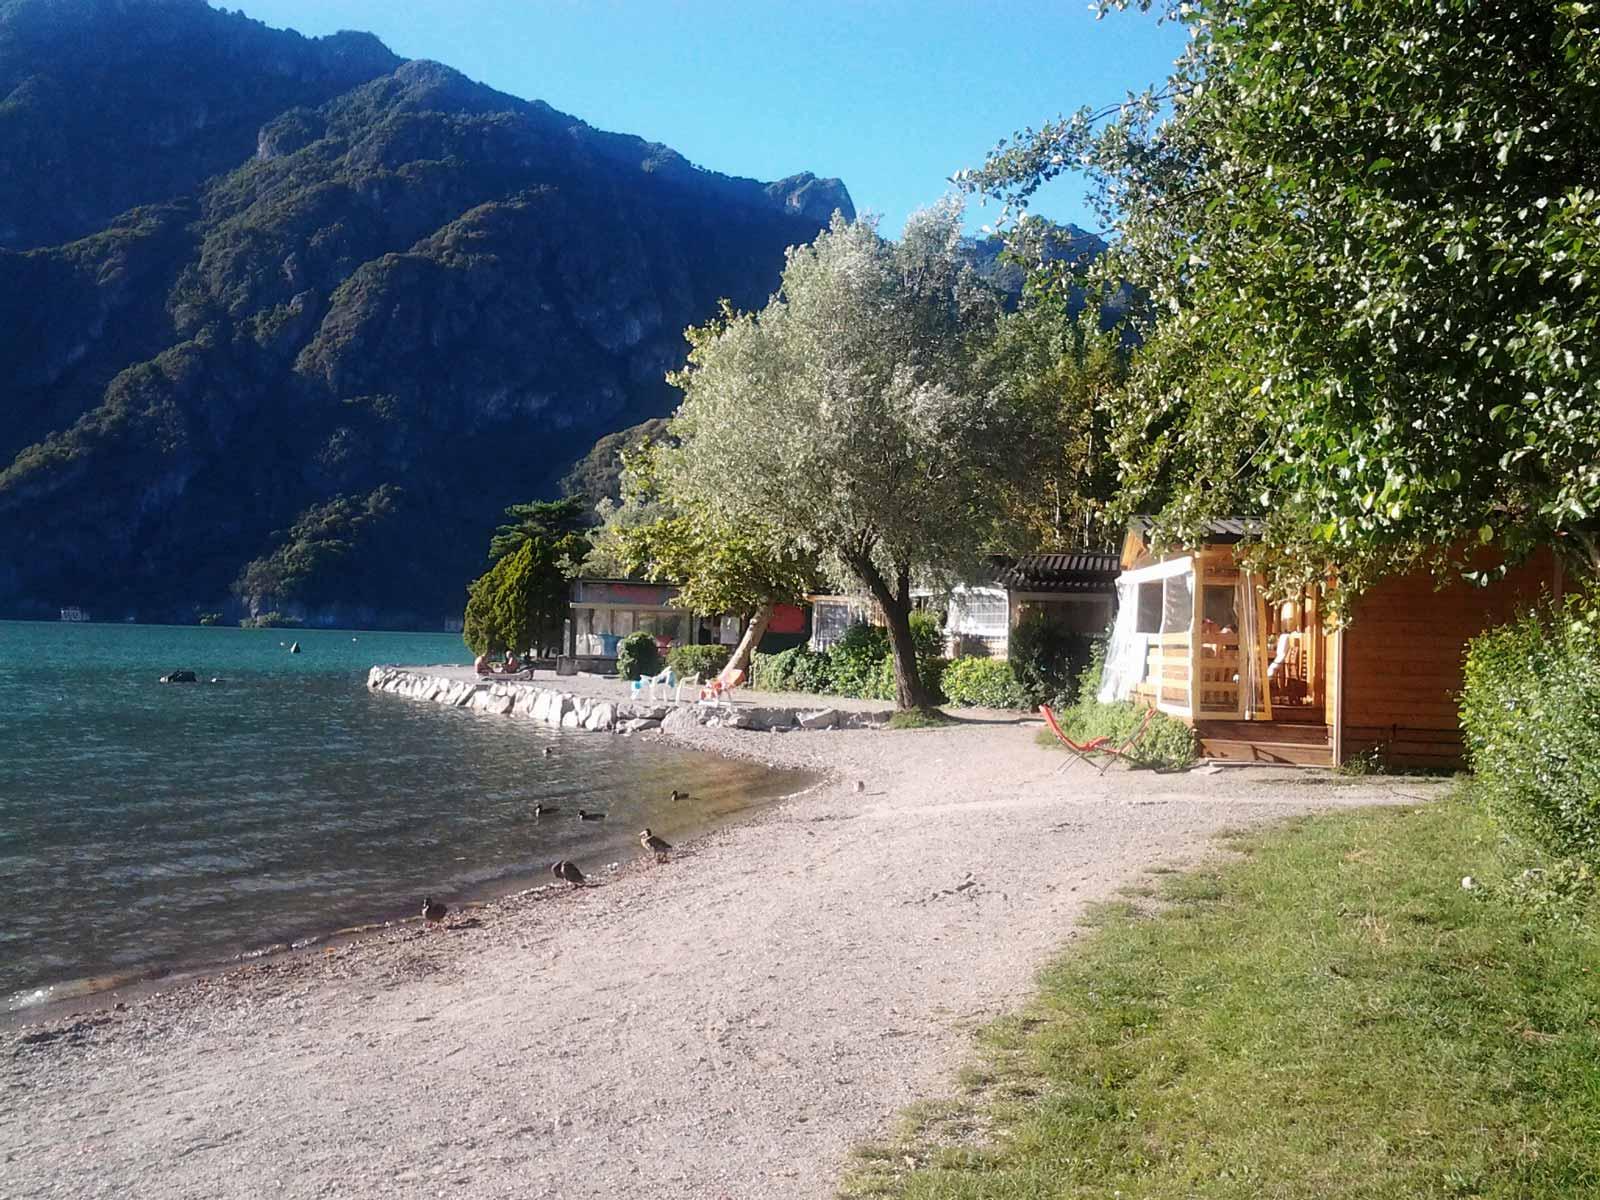 Lugano Chalet - Porlezza - Meer van Lugano - International Sport Camping - Het strand van de Camping